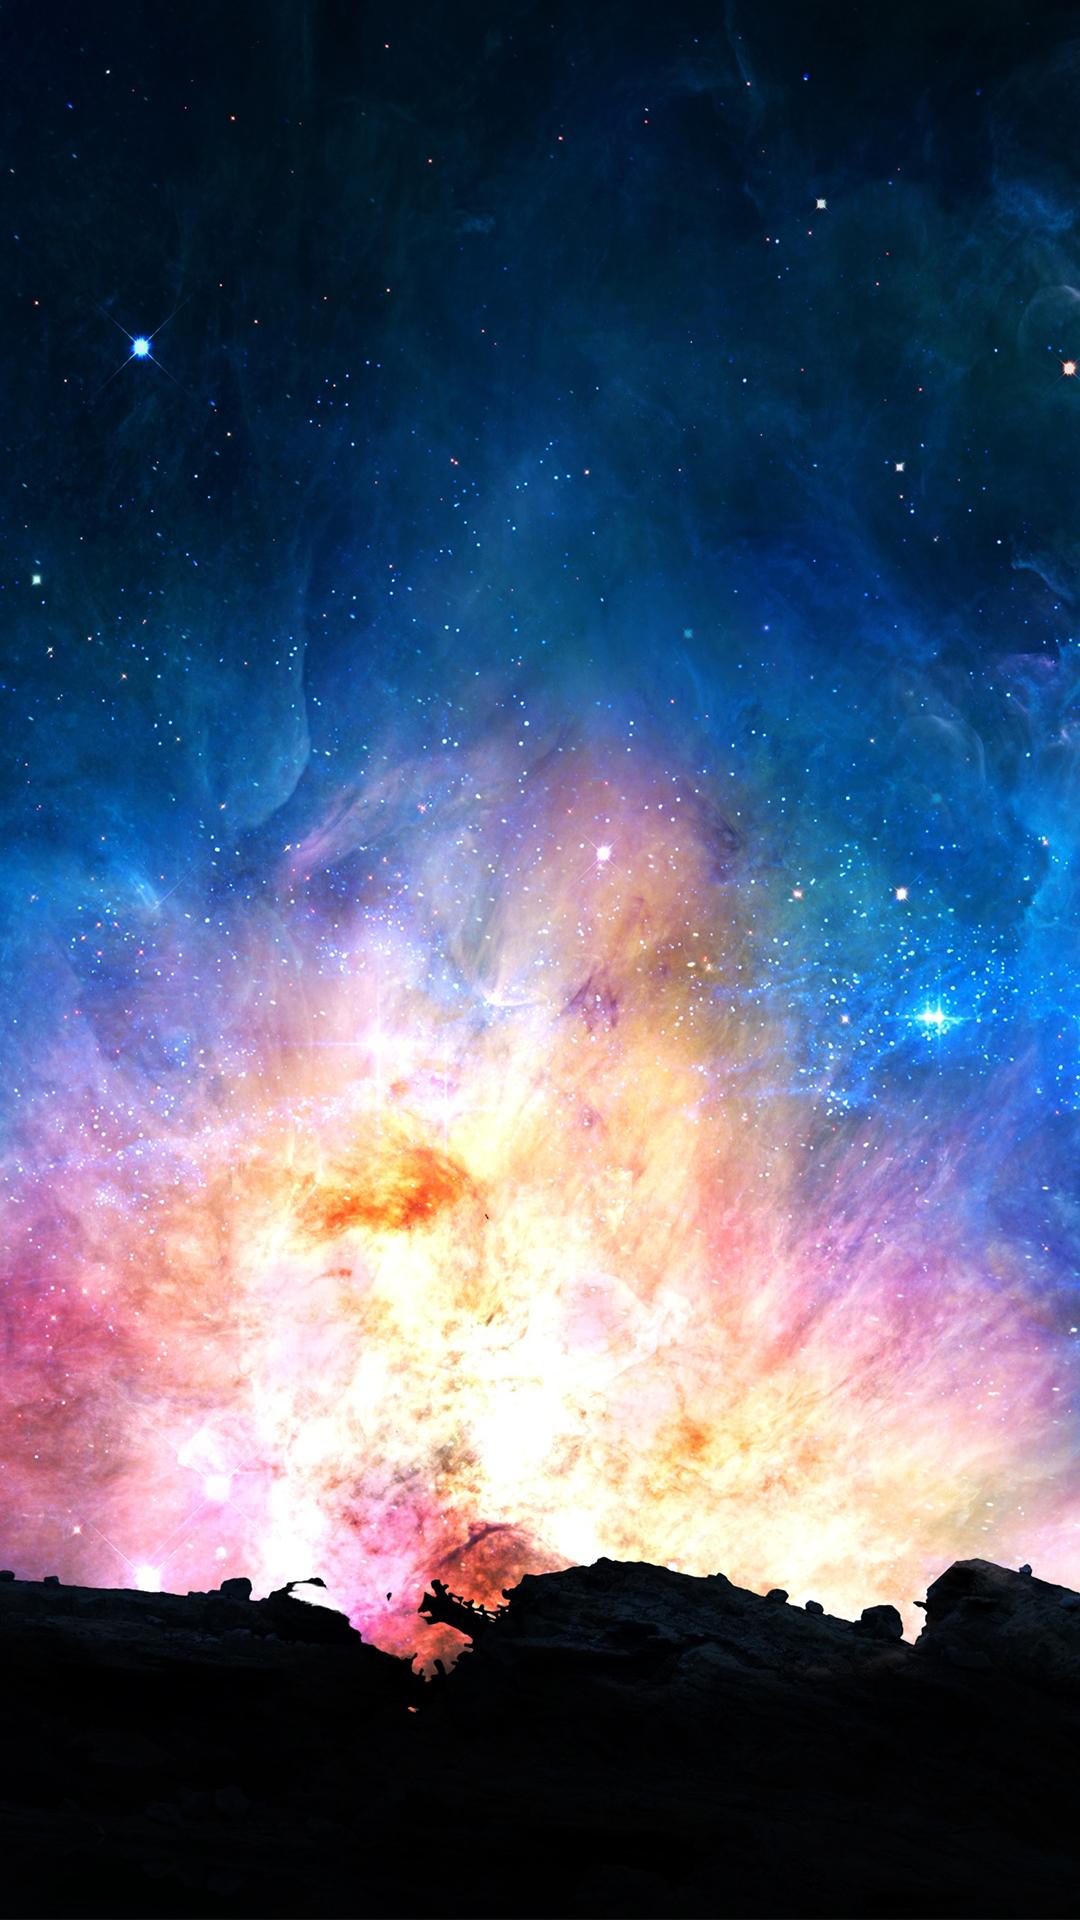 Galaxy Power IPhone 6 Wallpaper Plus HD 1080x1920